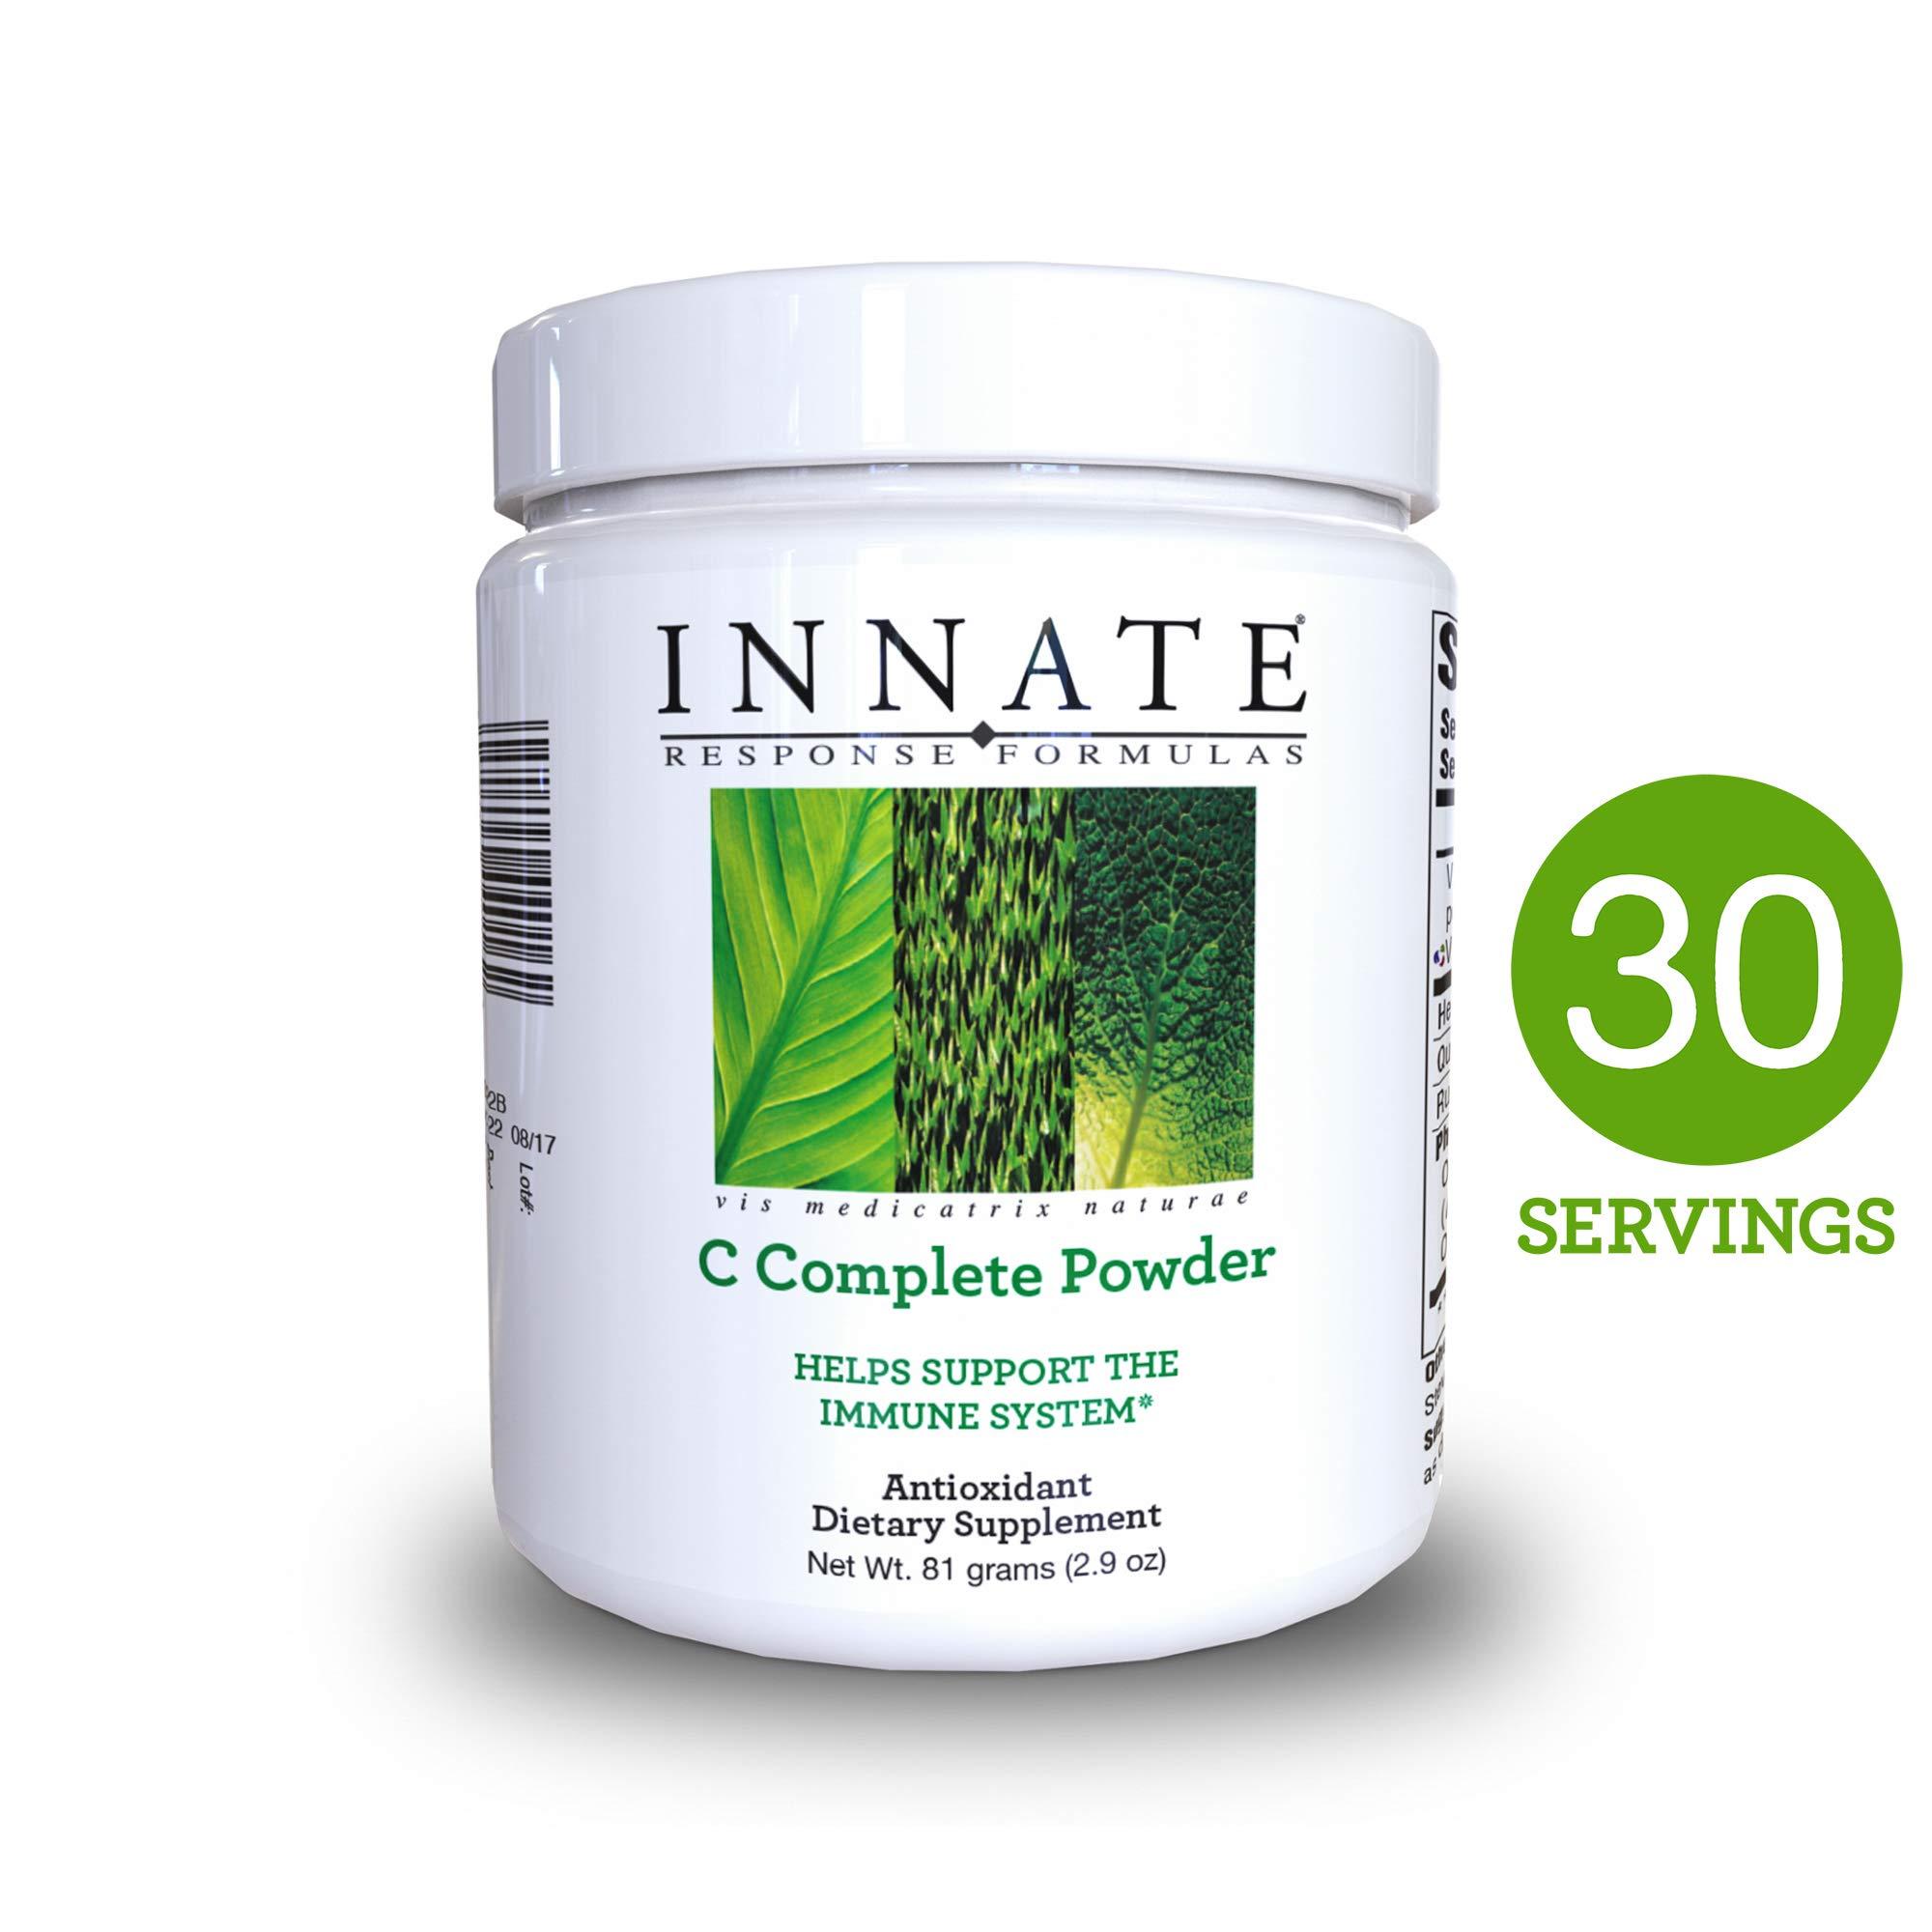 INNATE Response Formulas - C Complete Powder, Unique and Gentle Powdered Vitamin C Formula, 30 Servings (81 grams)